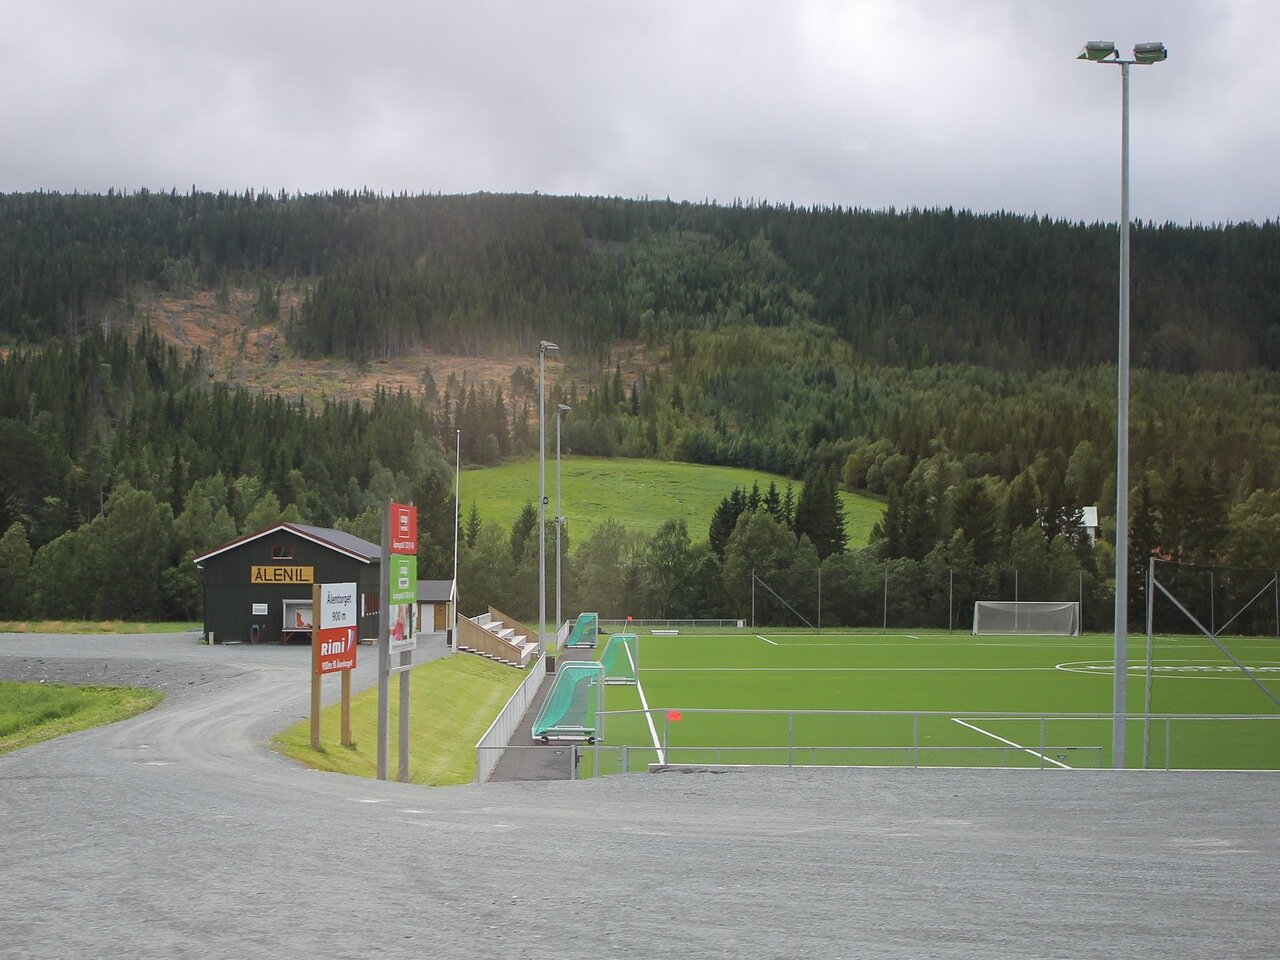 Sør-Trøndelag, Alen village